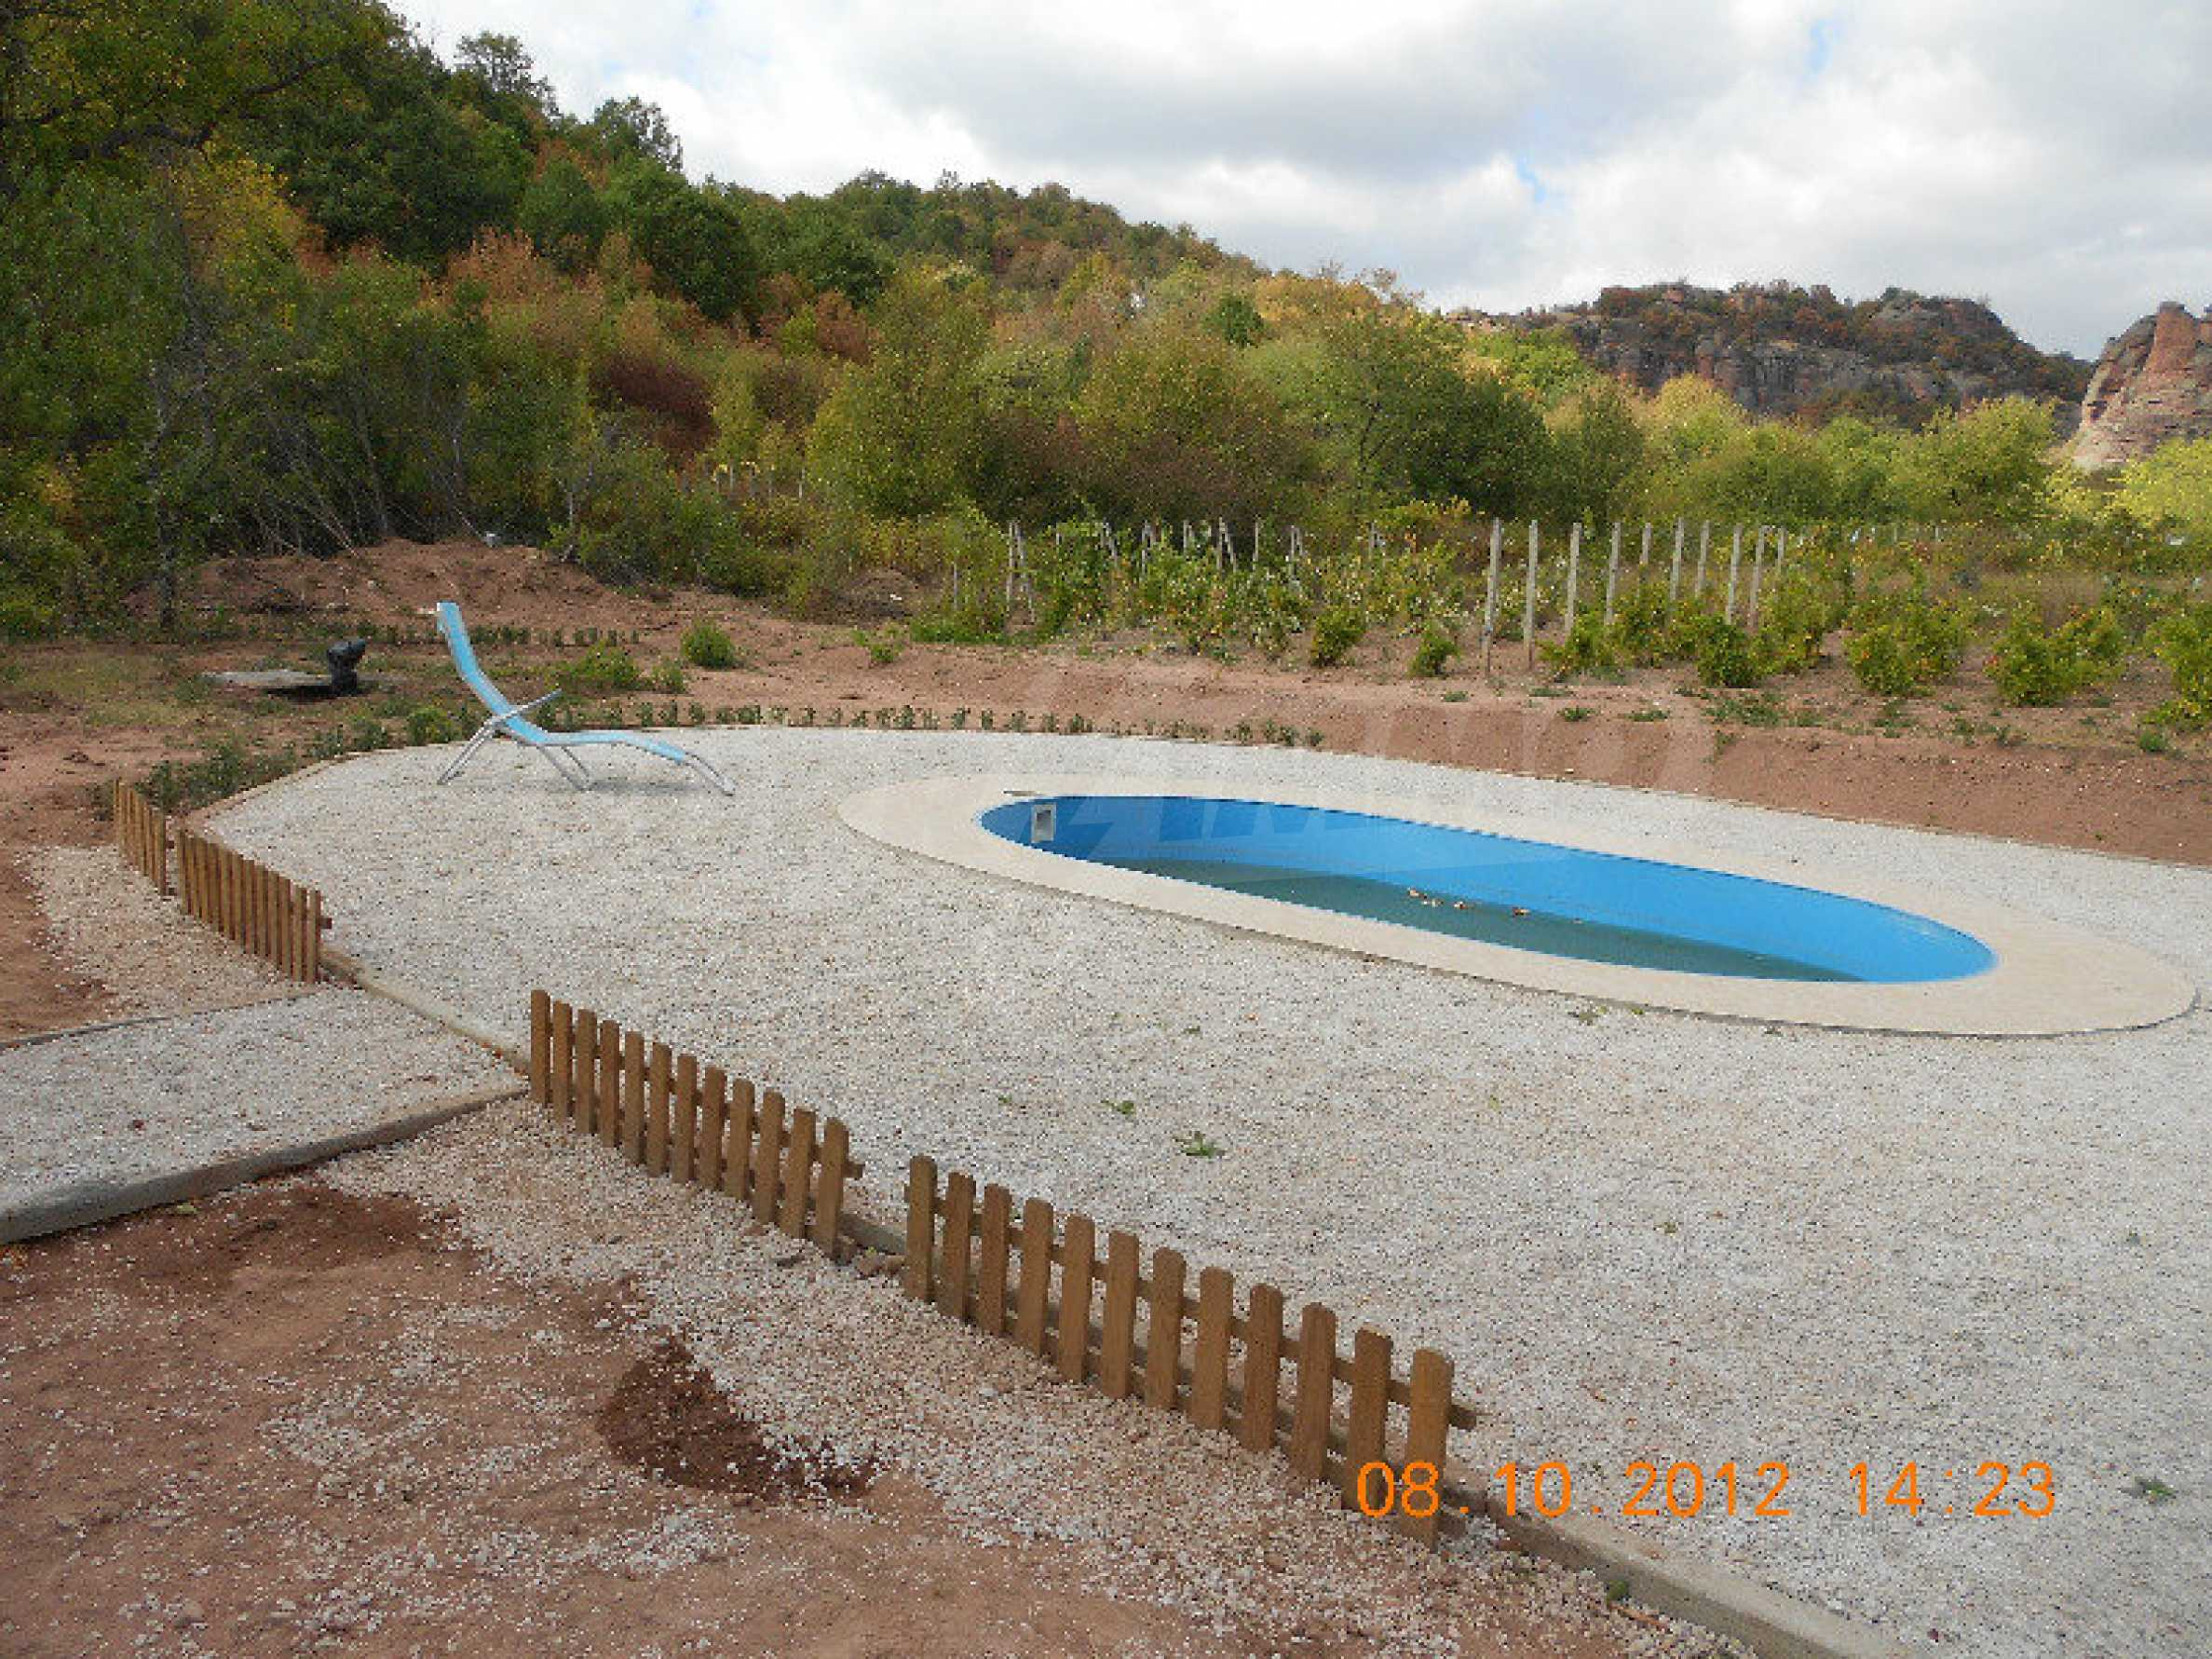 3-storey villa with garden and small plunge pool near Belogradchik 20